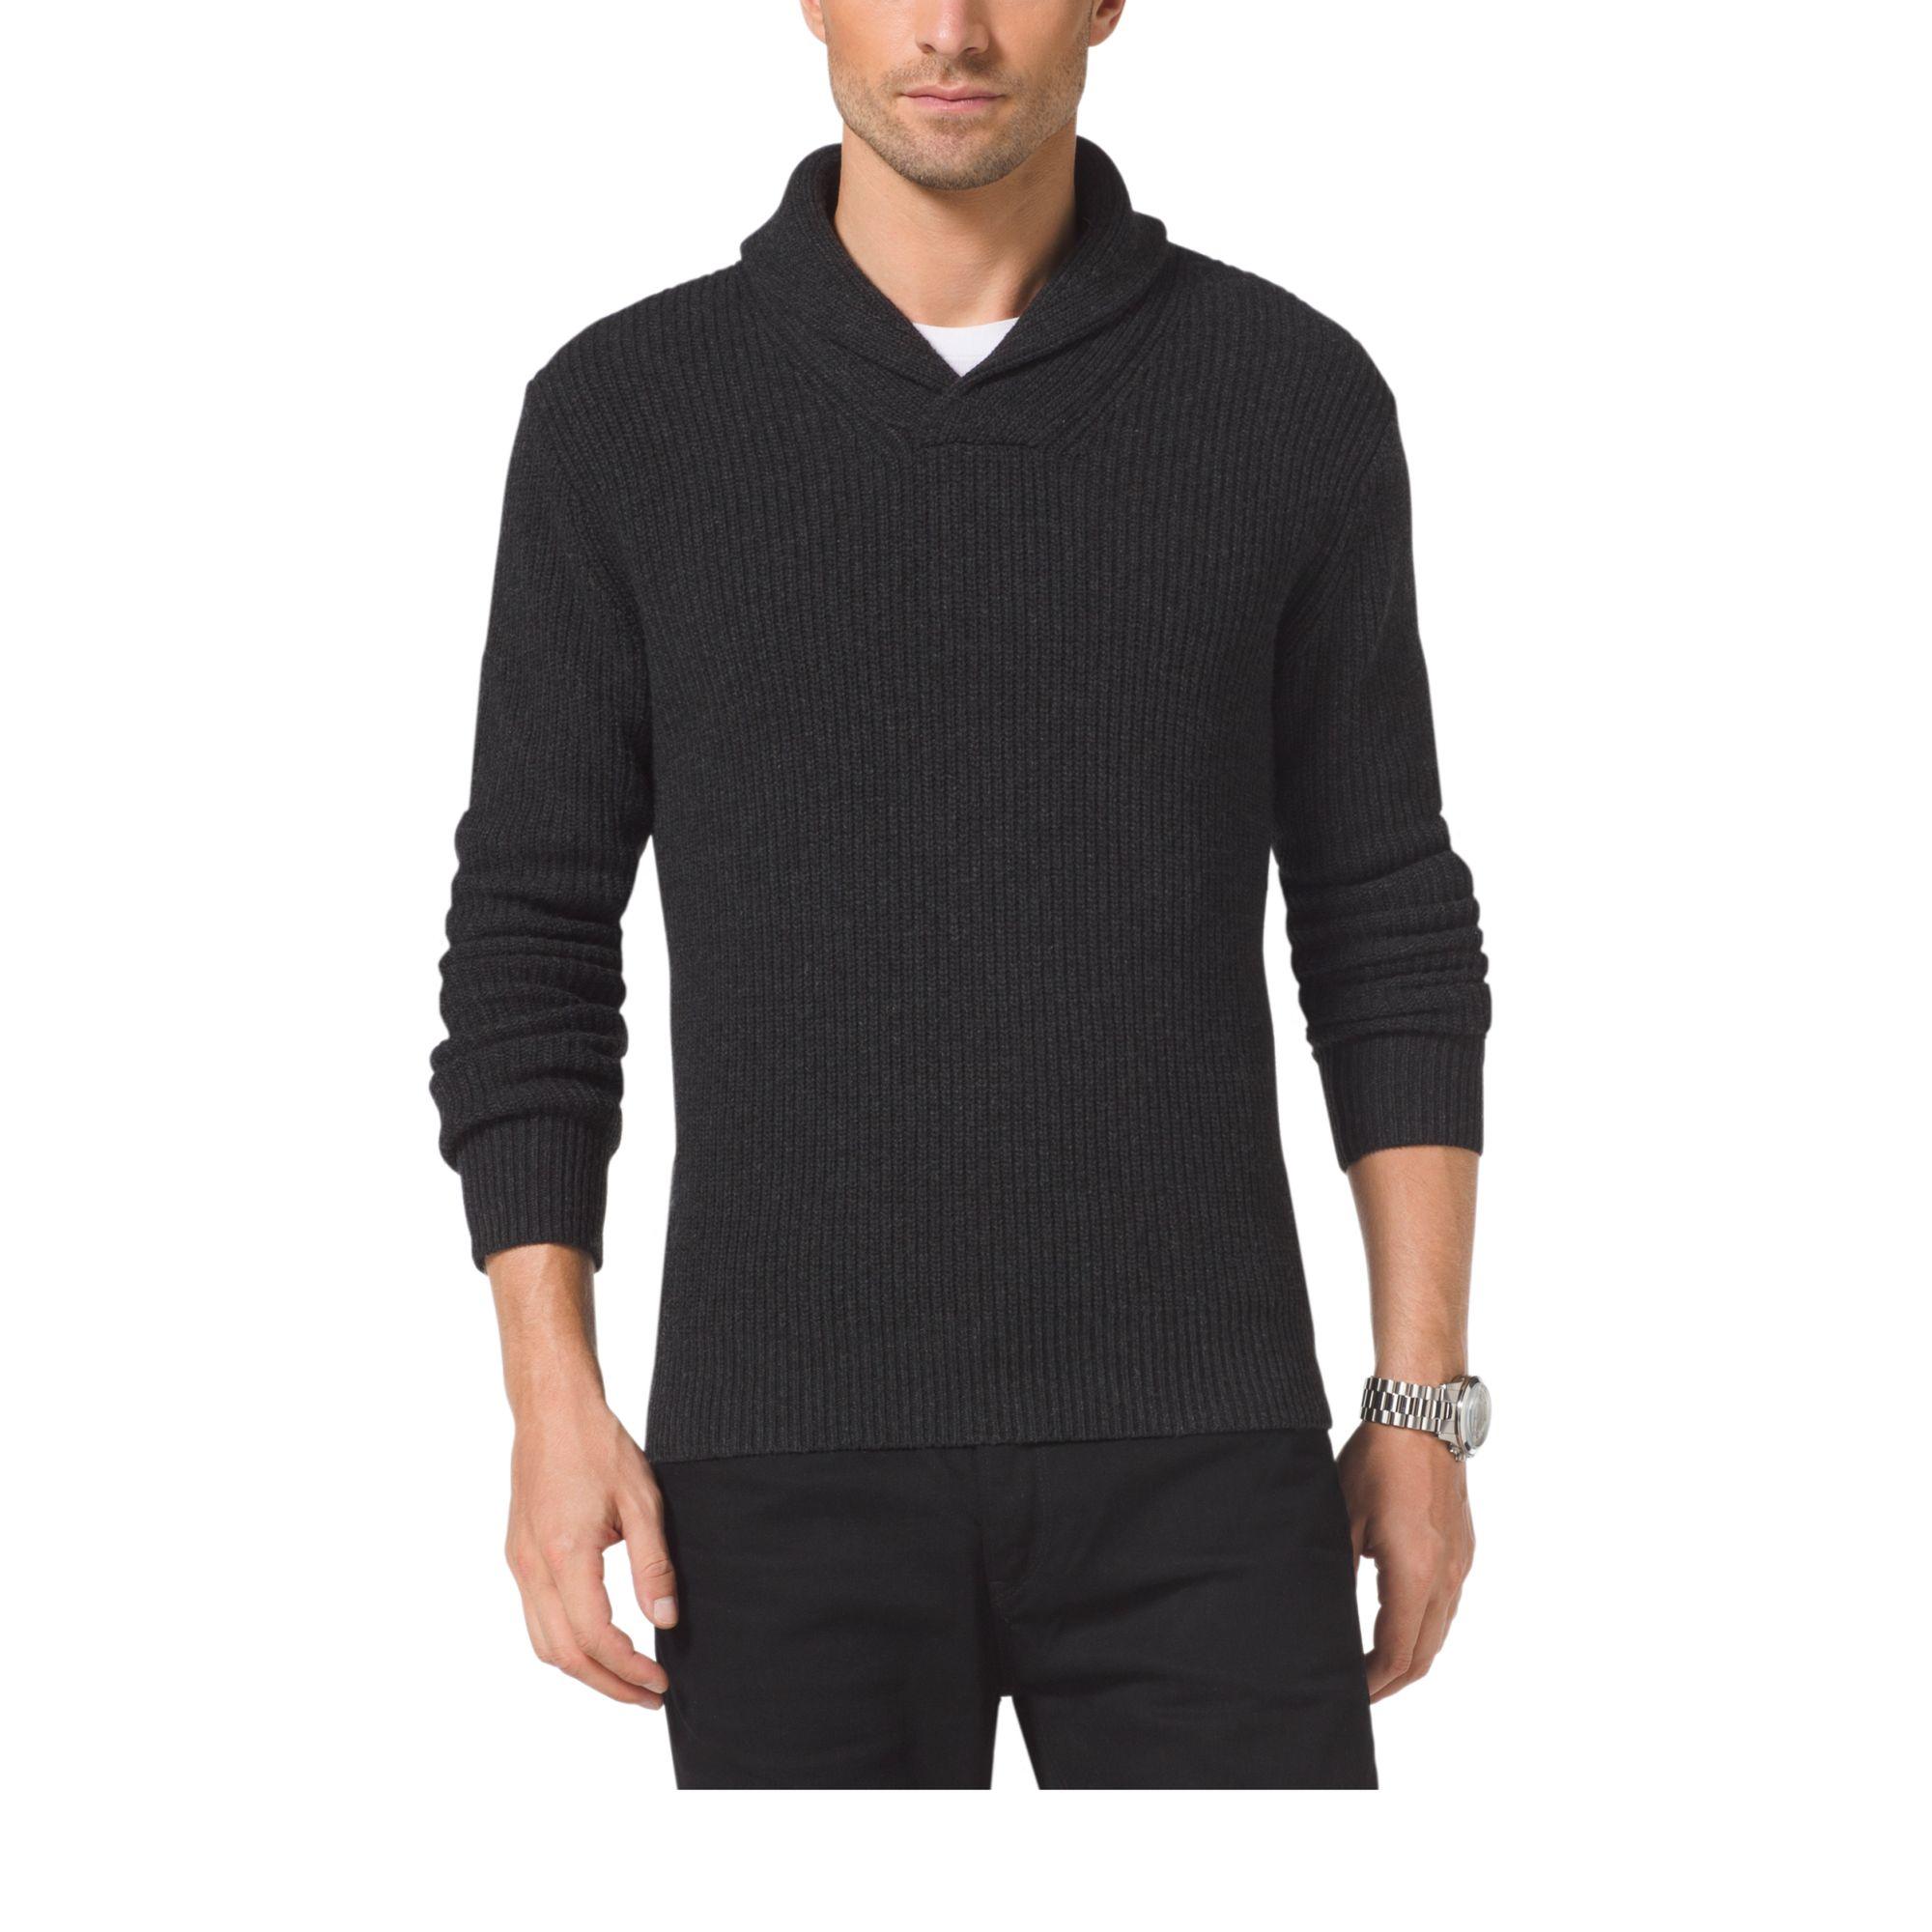 Michael kors Wool-blend Shawl Sweater for Men